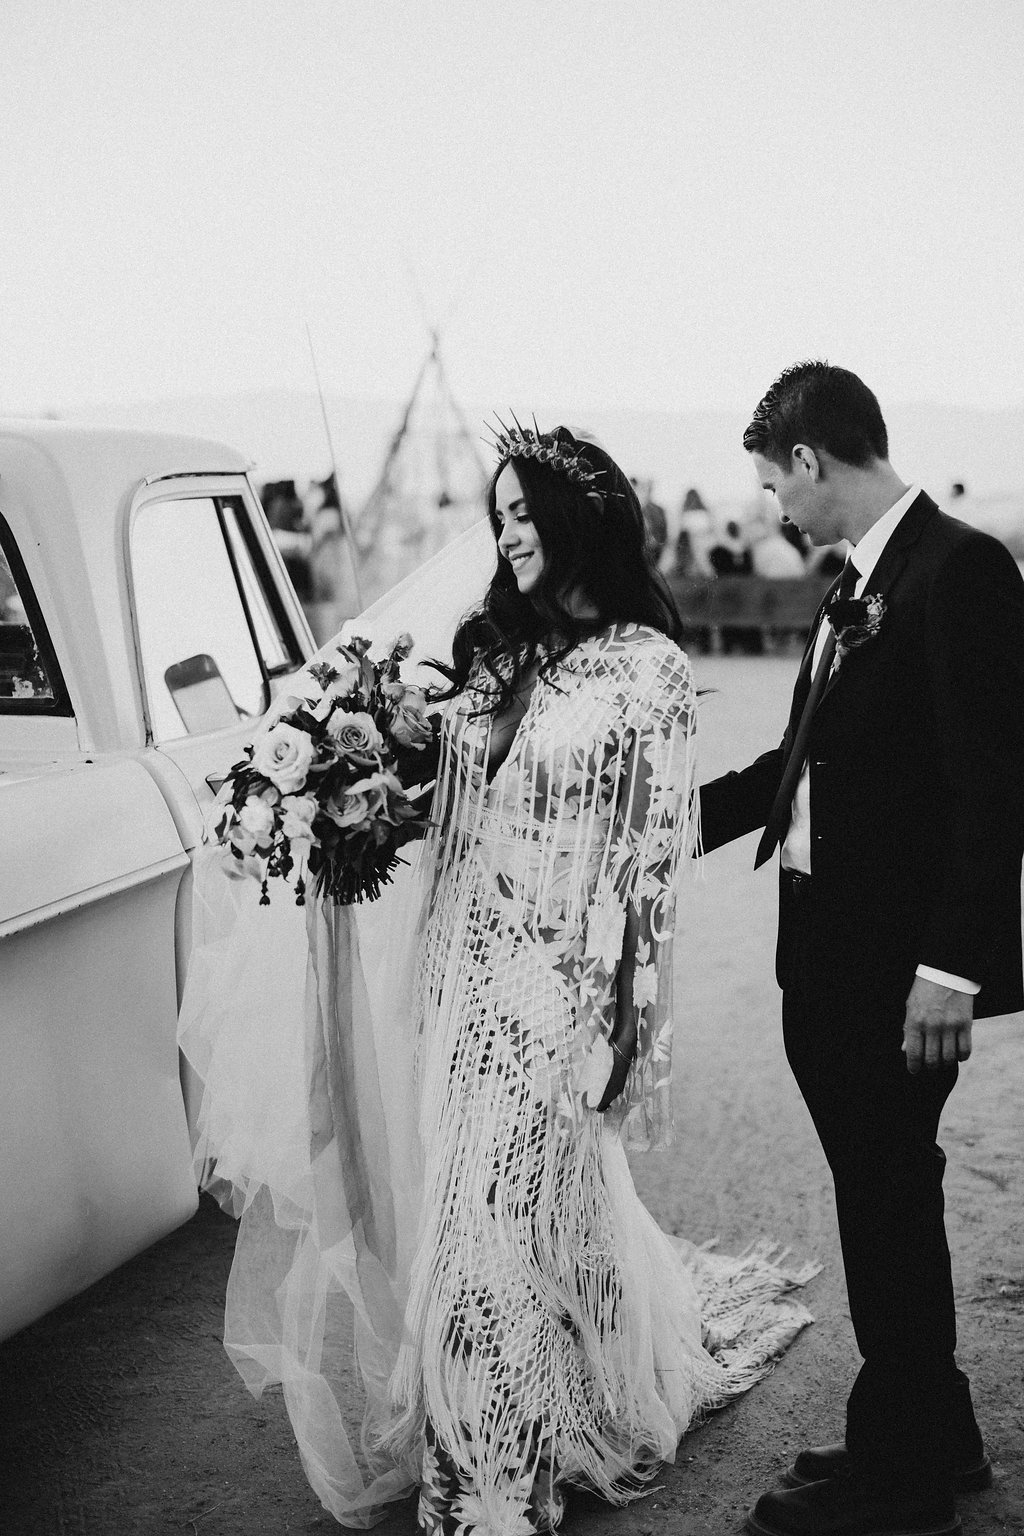 bohemian-wedding-dress-nashville.jpg